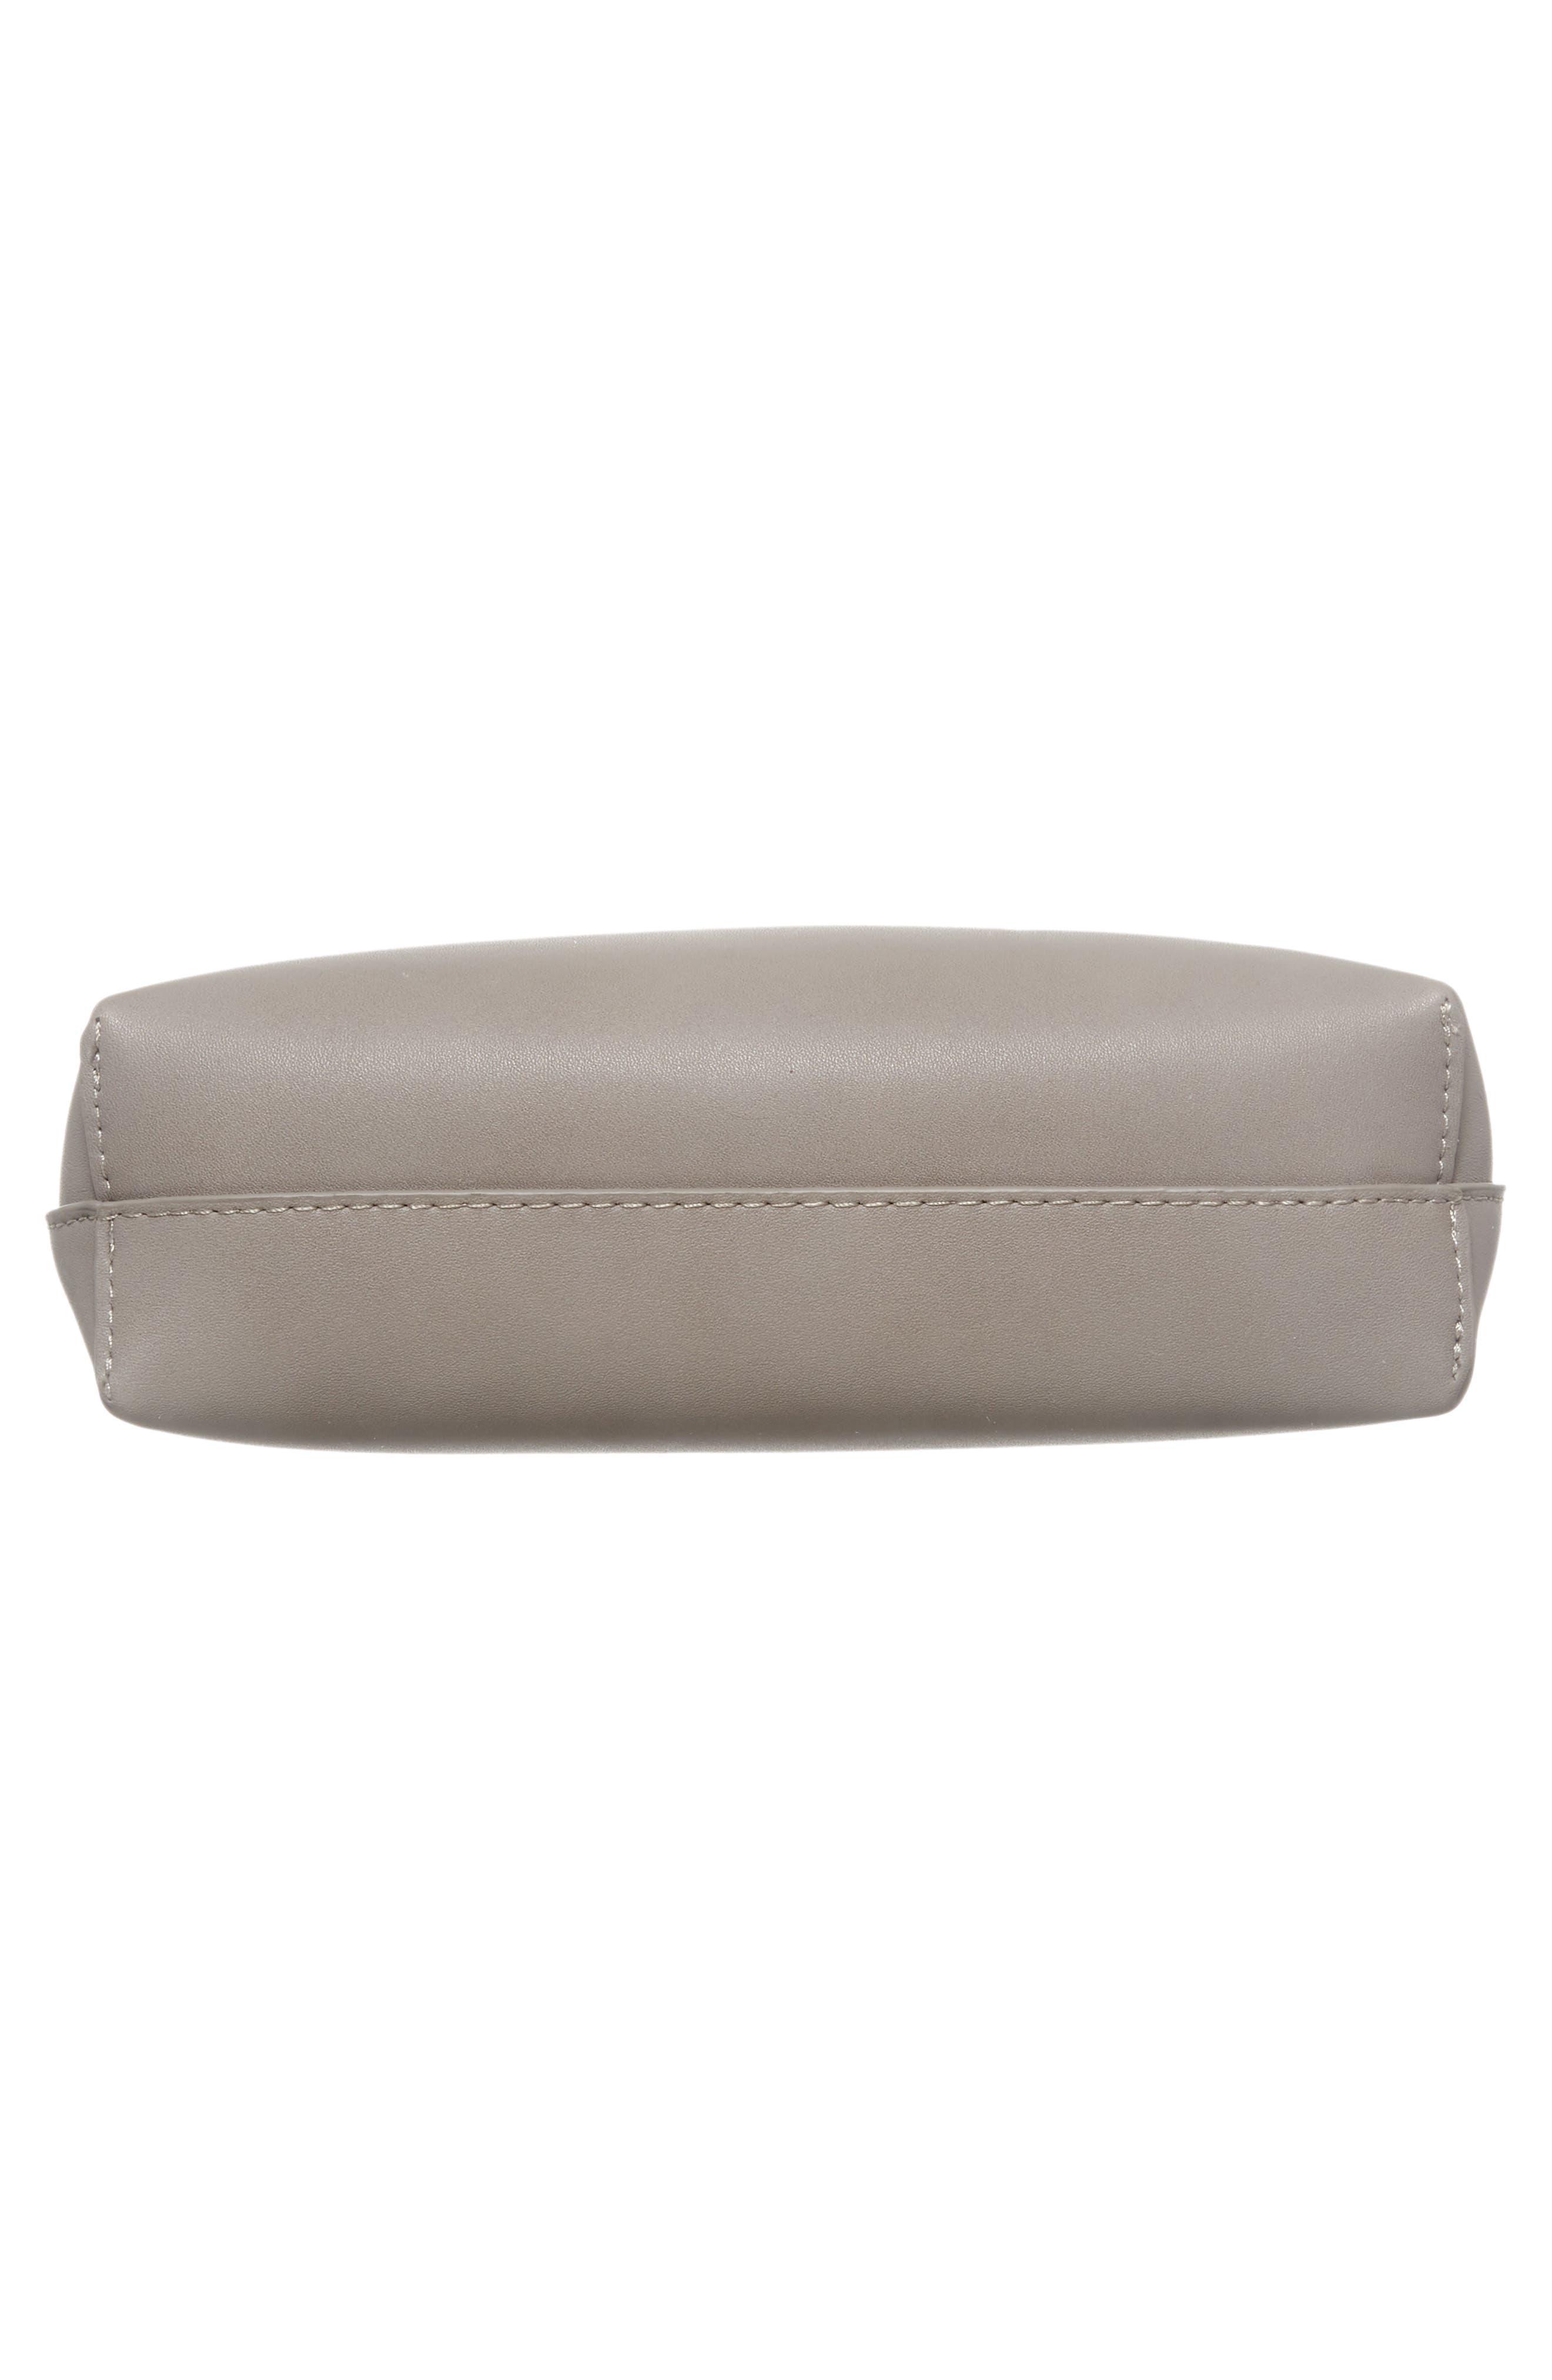 Metal Handle Faux Leather Crossbody Bag,                             Alternate thumbnail 6, color,                             020